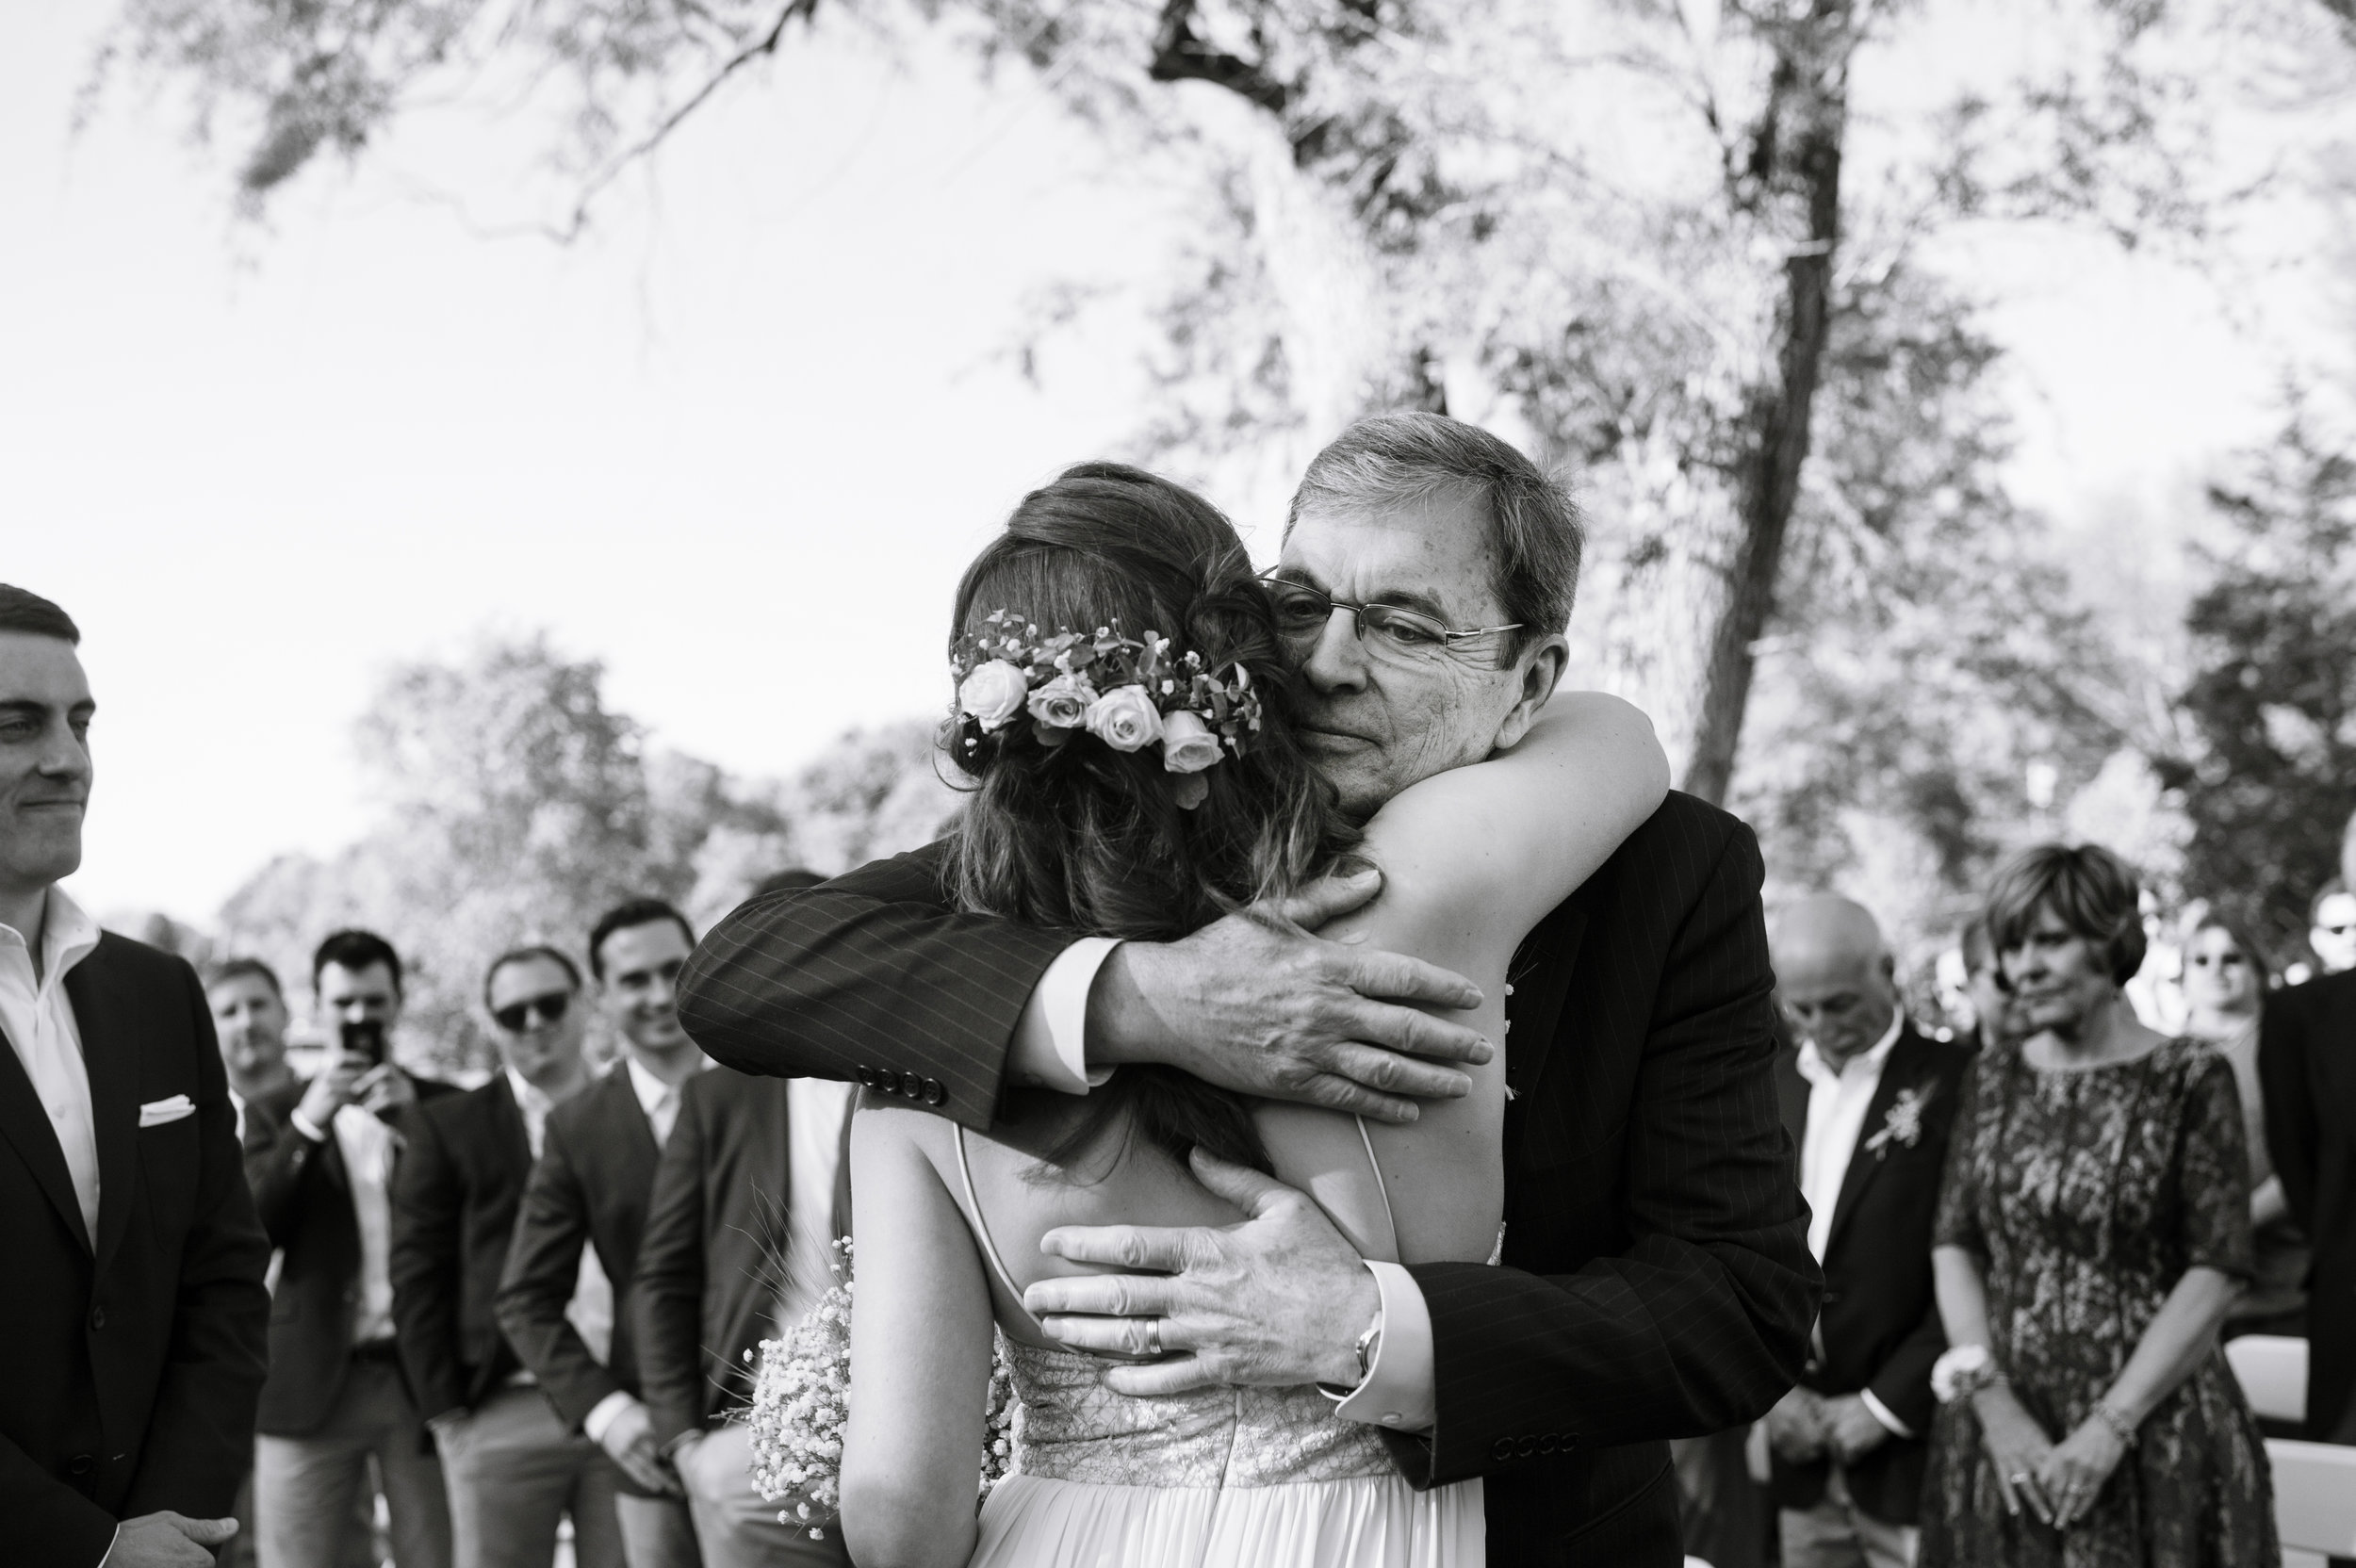 Candid-Wedding-Photography-Boston019.jpg